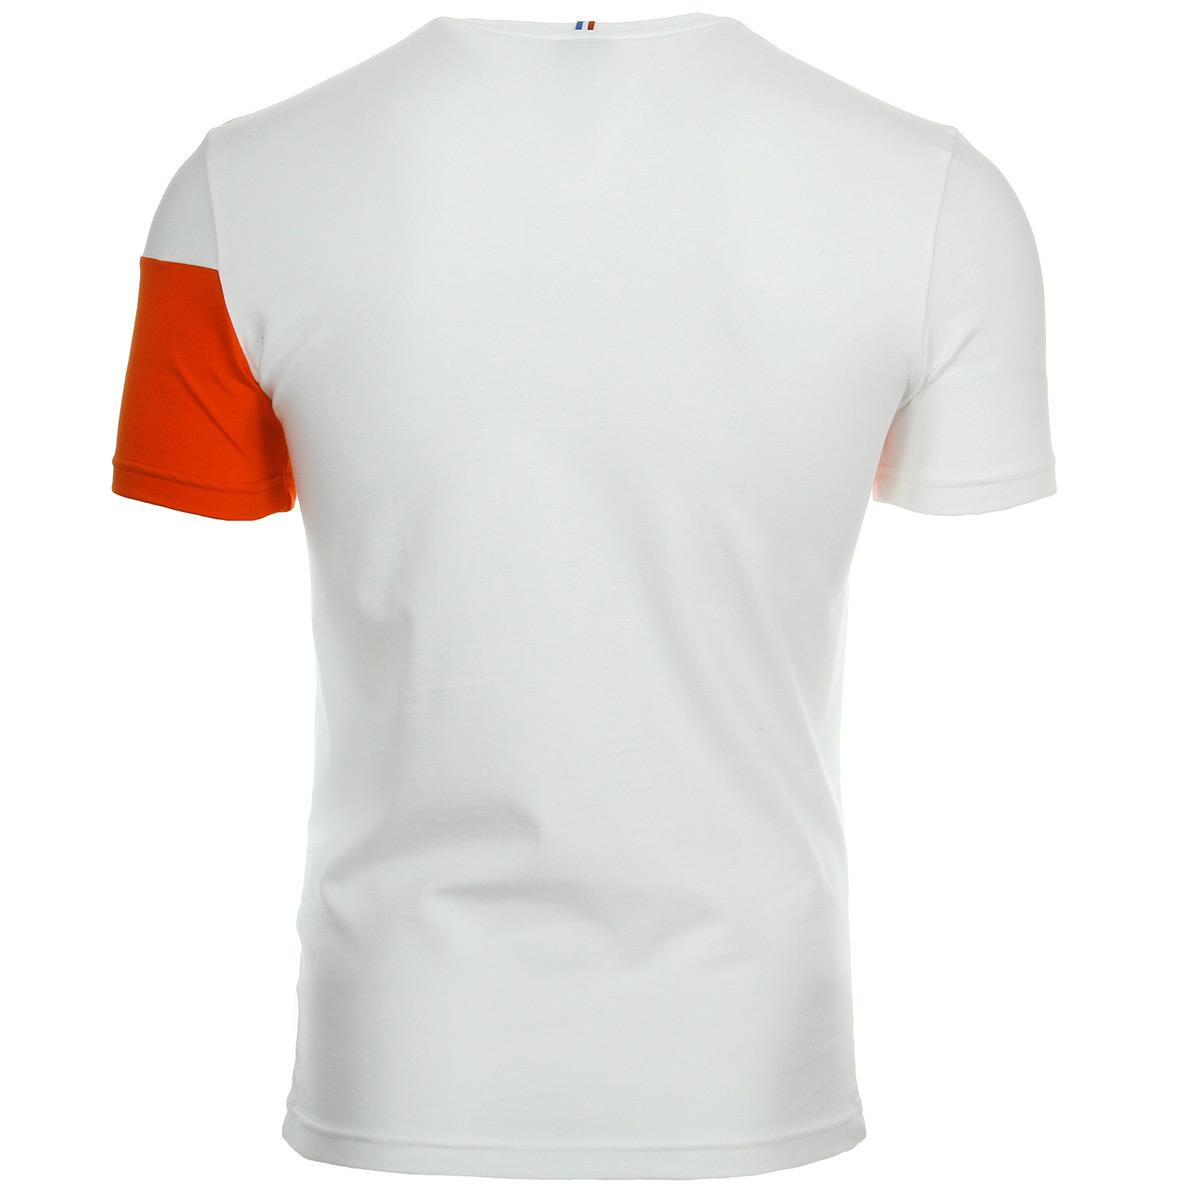 shirts Ess Sportif Le Tee Homme Saison Coq Ss 1810492T WE2IeDH9Yb